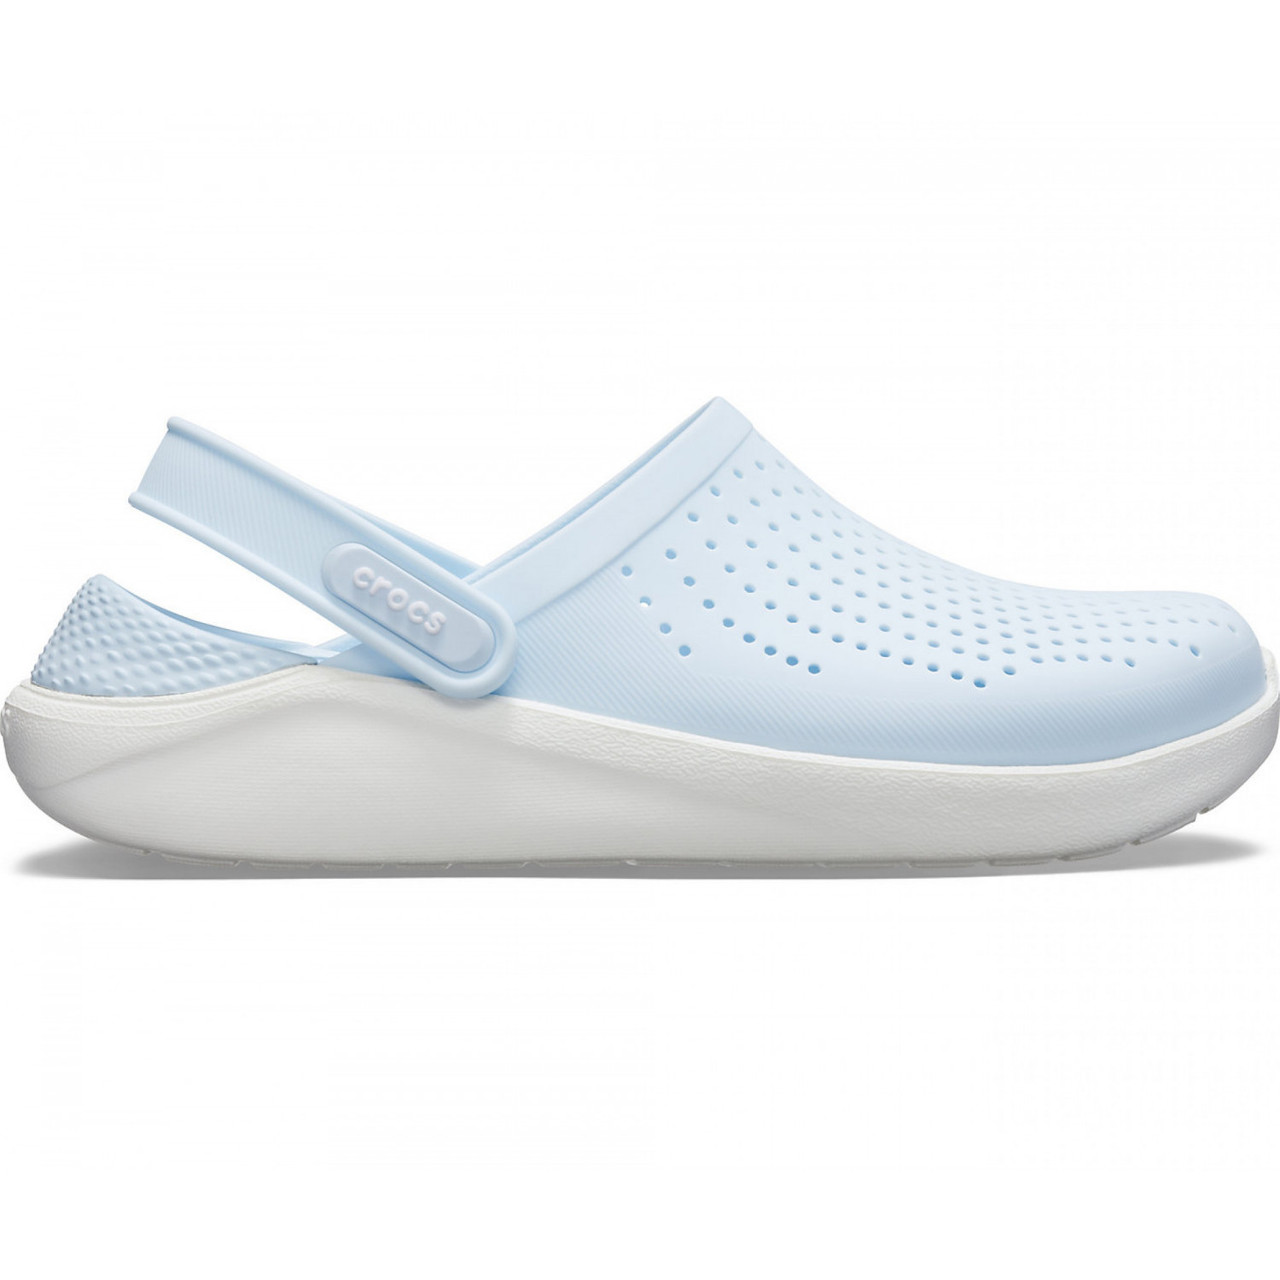 Crocs LiteRide Mineral Blue